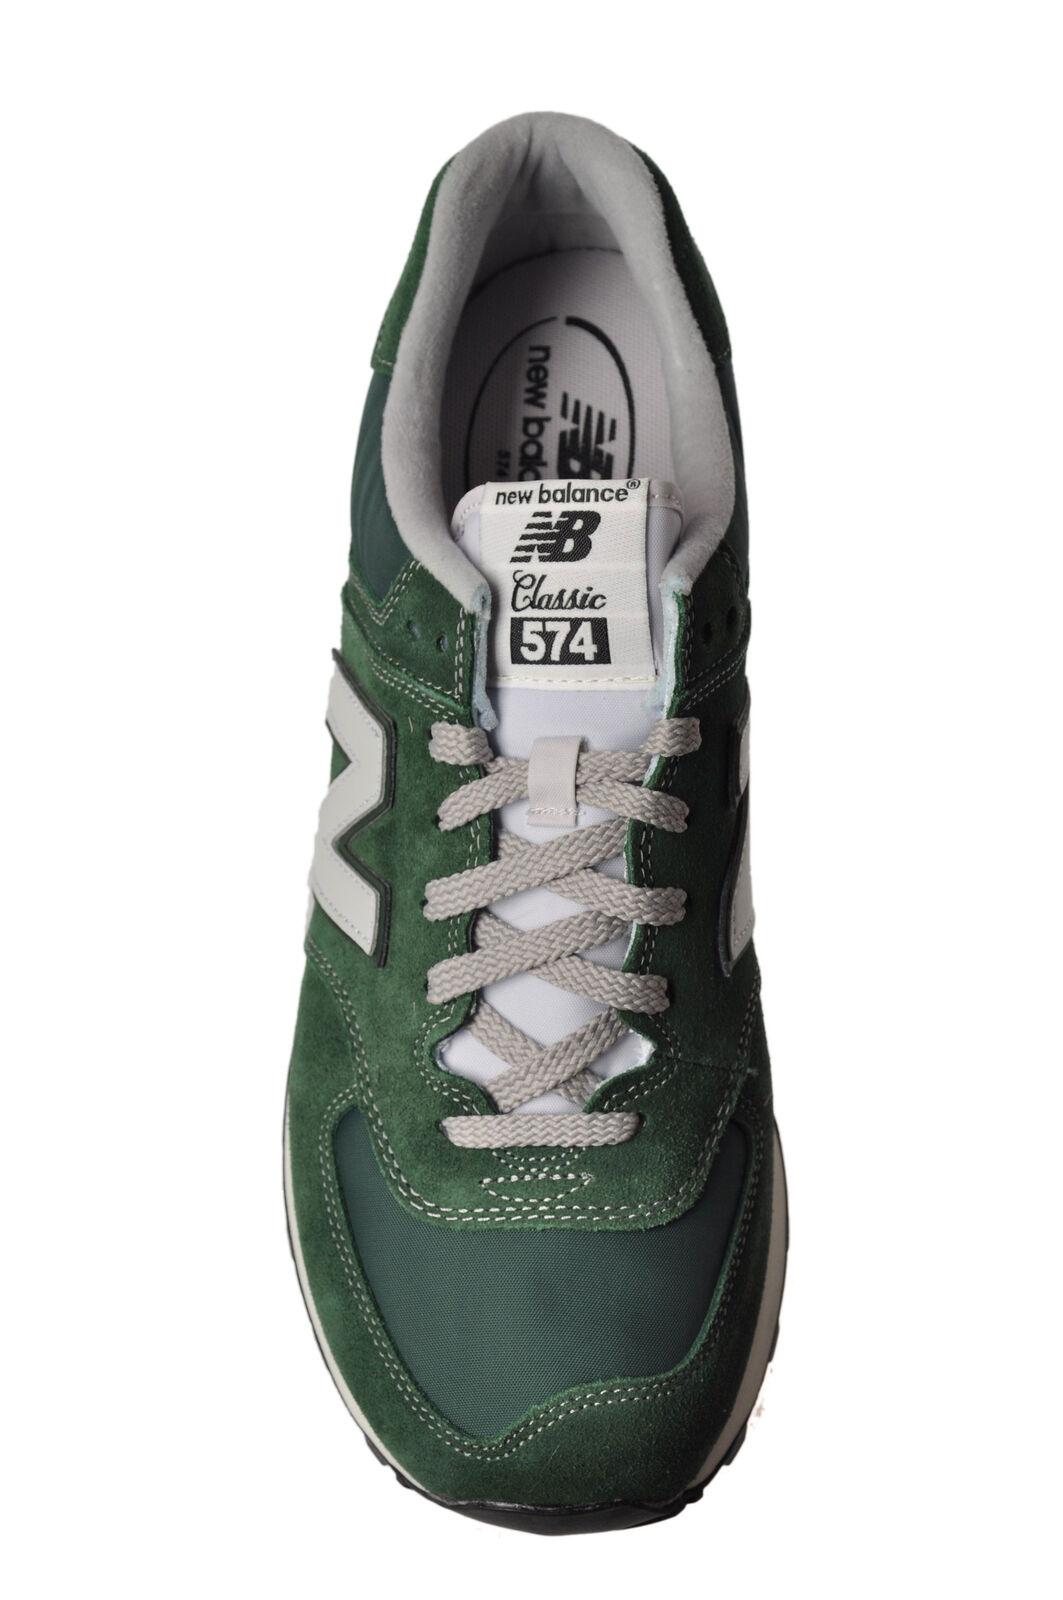 reputable site 9ffbd ab921 ... 892427B194812 New Balance Balance Balance - Schuhe-Turnschuhe-niedrige  - Mann - Grün - 892427B194812. Air Jordan ...